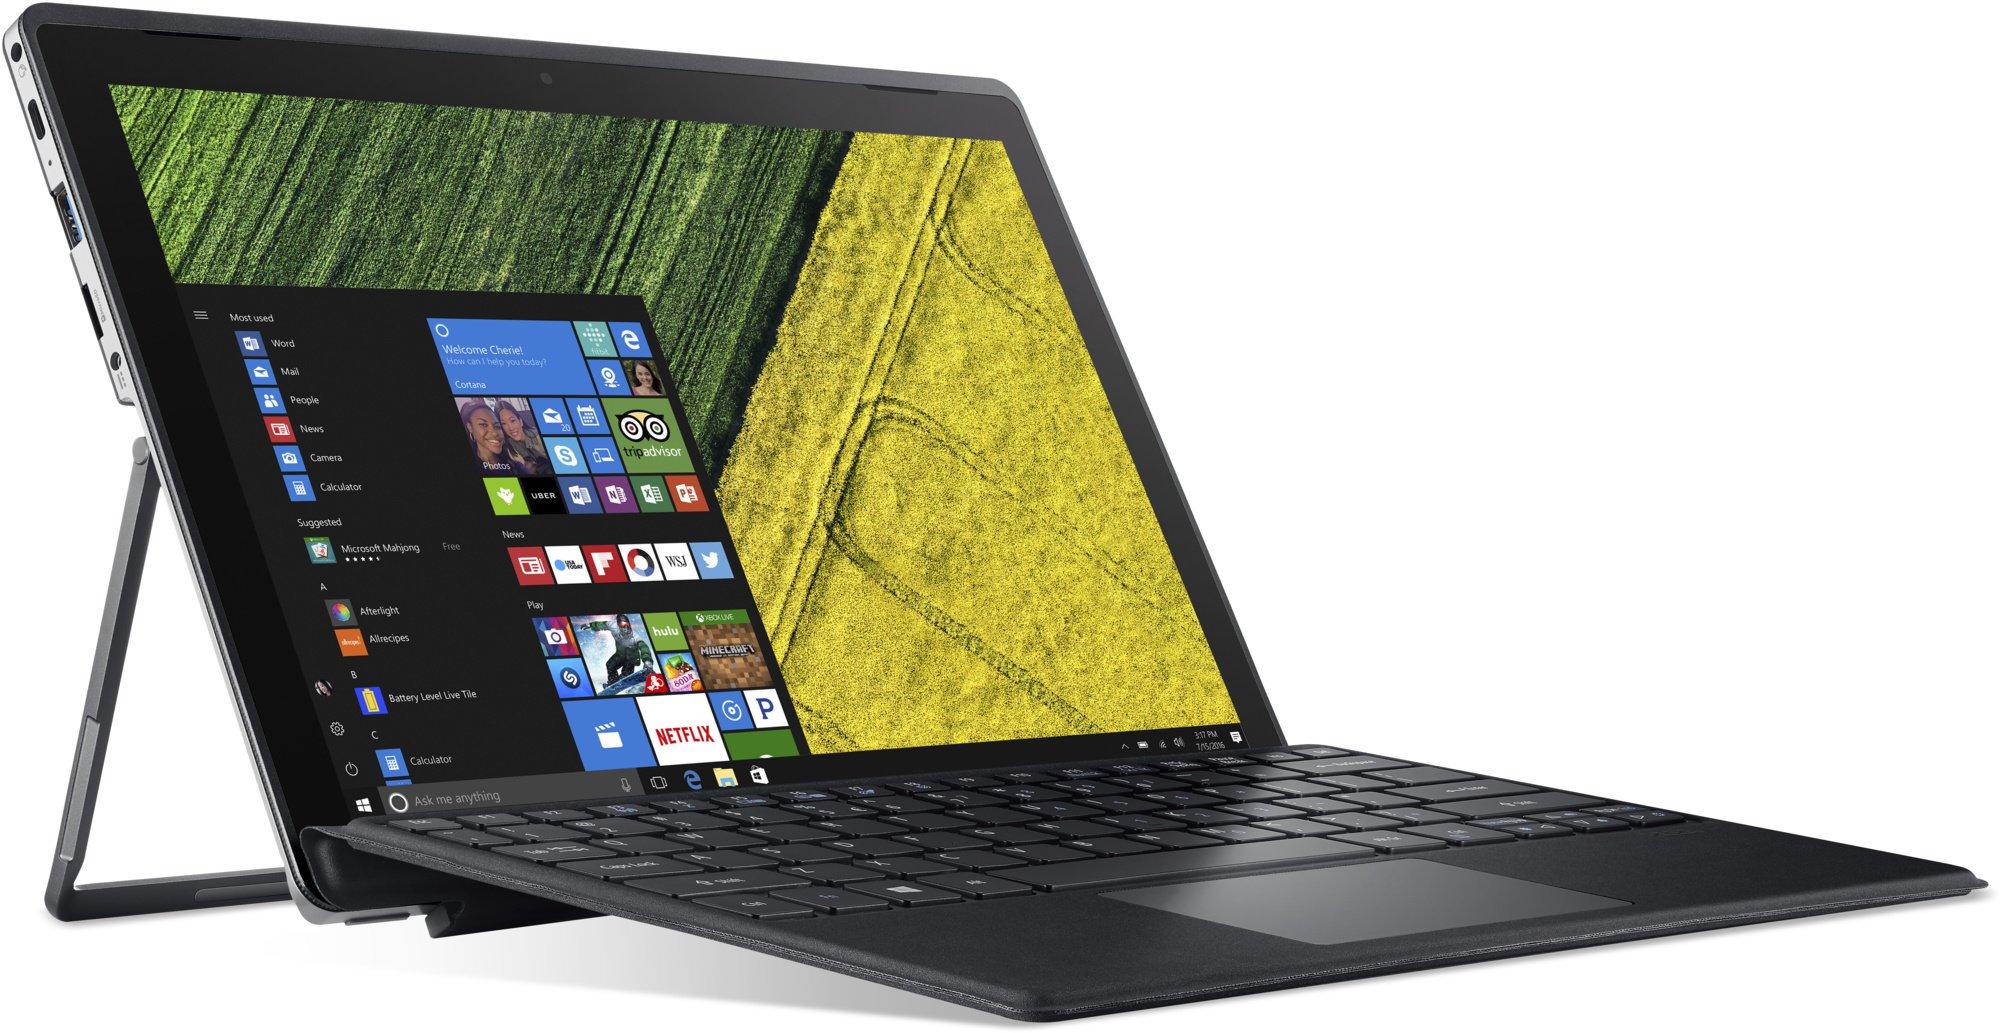 Acer Switch 3 - 12T''/N4200/64GB/4G/W10 + stylus